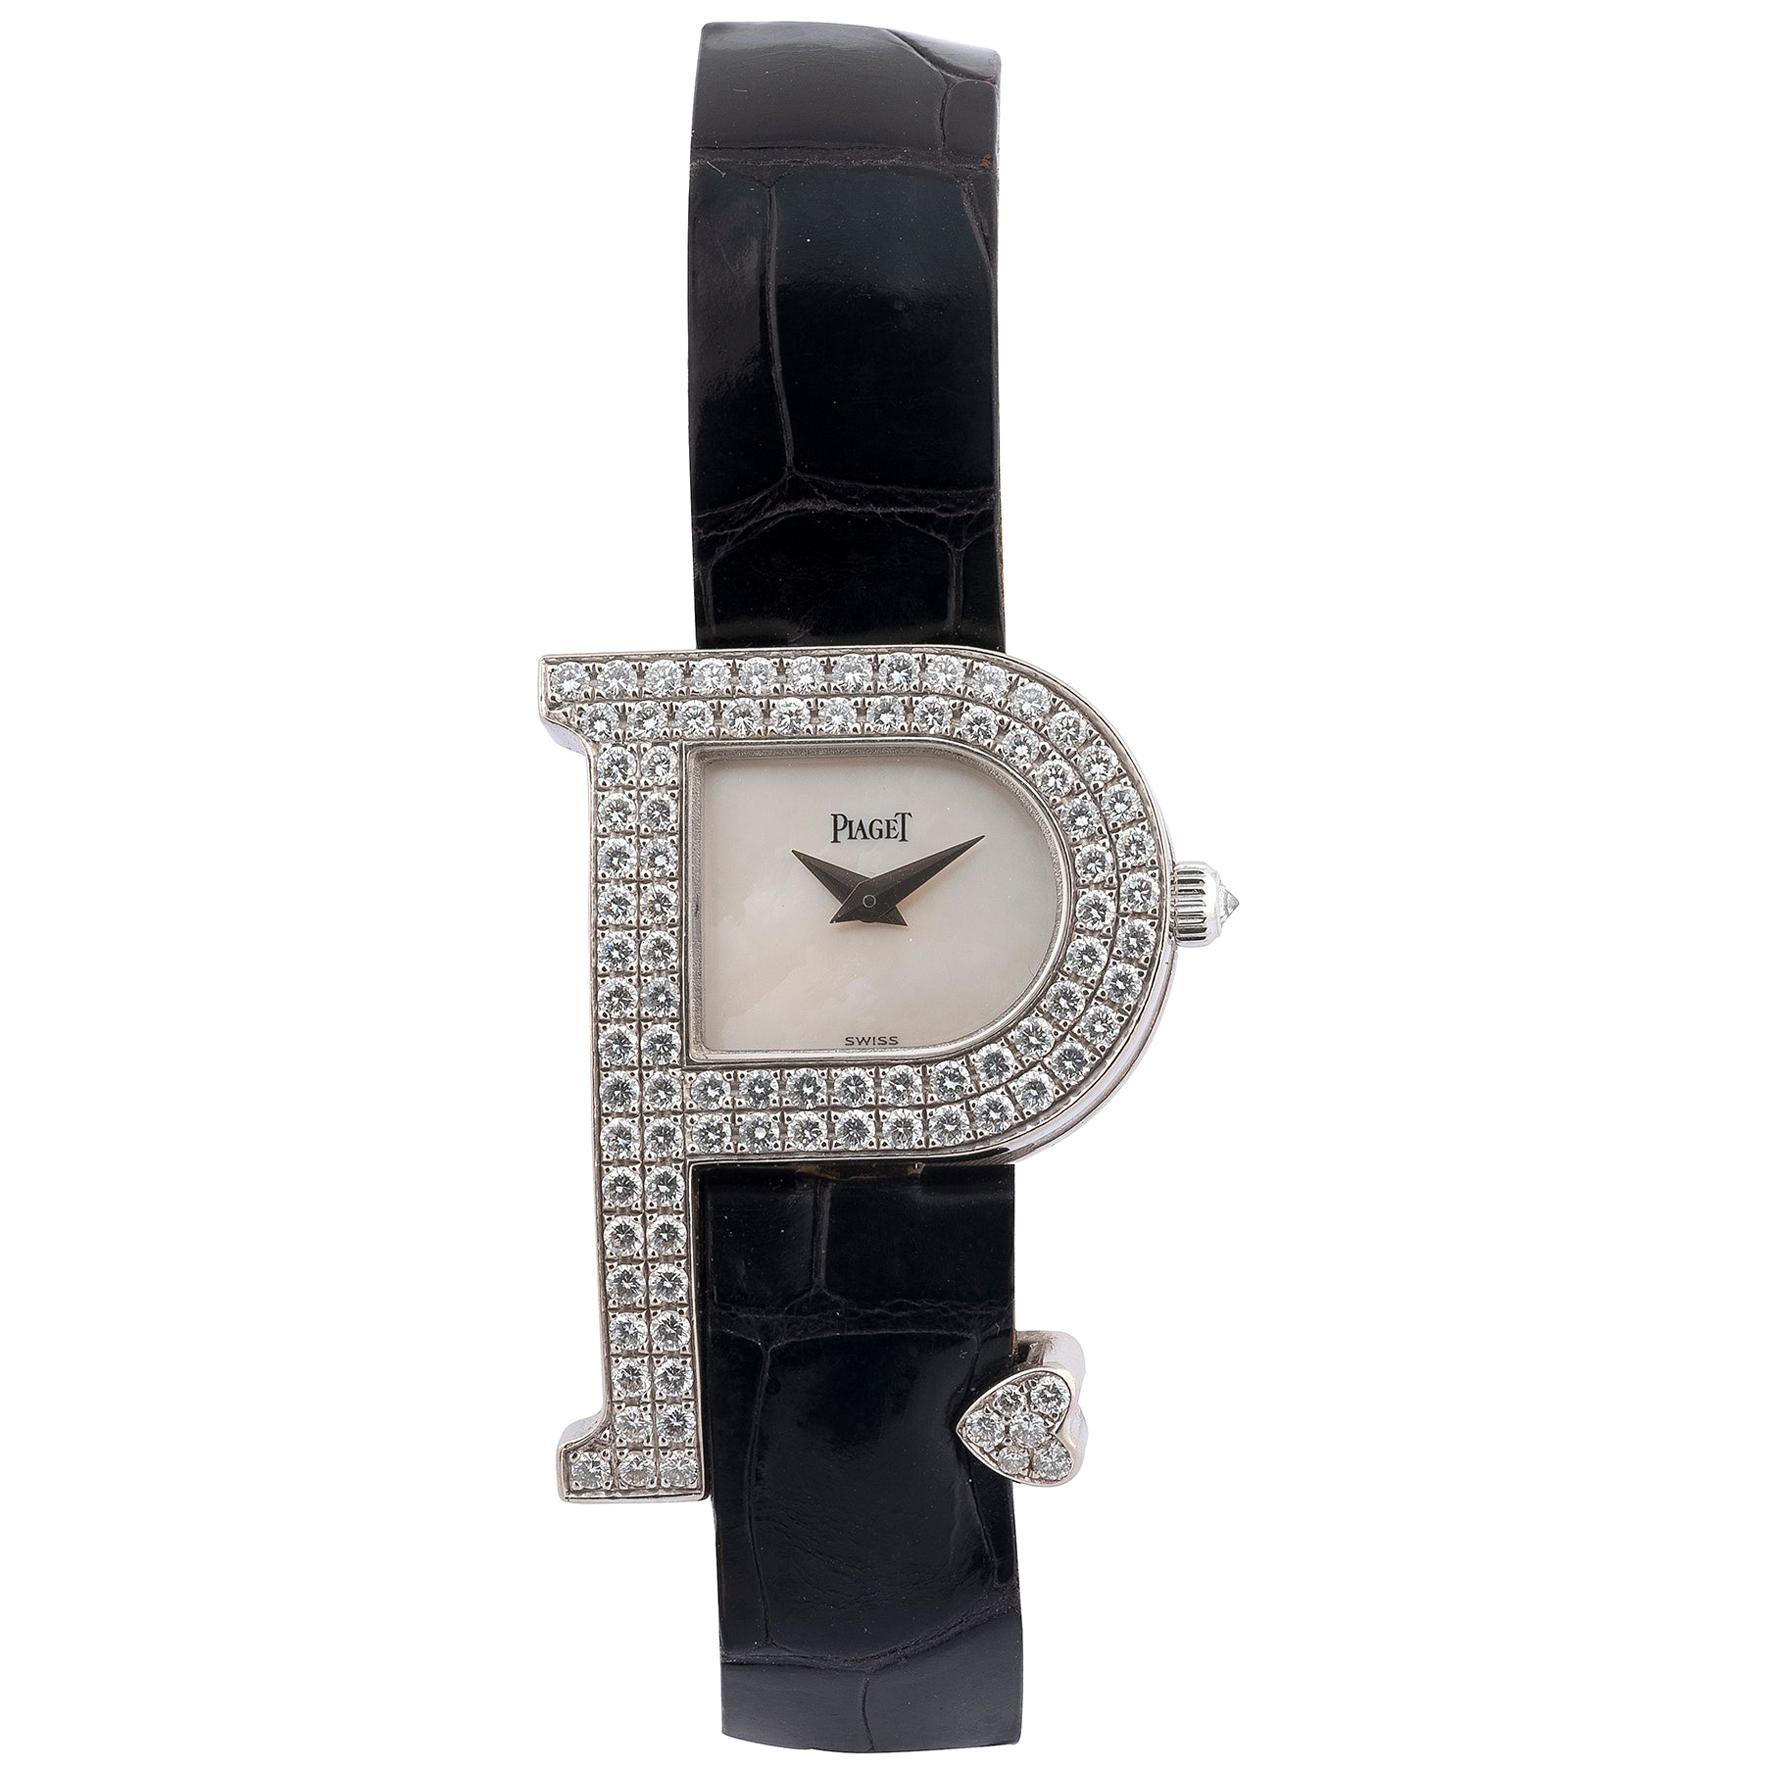 Piaget, a Ladies 18 Karat White Gold and Diamond-Set P-Shaped Wristwatch